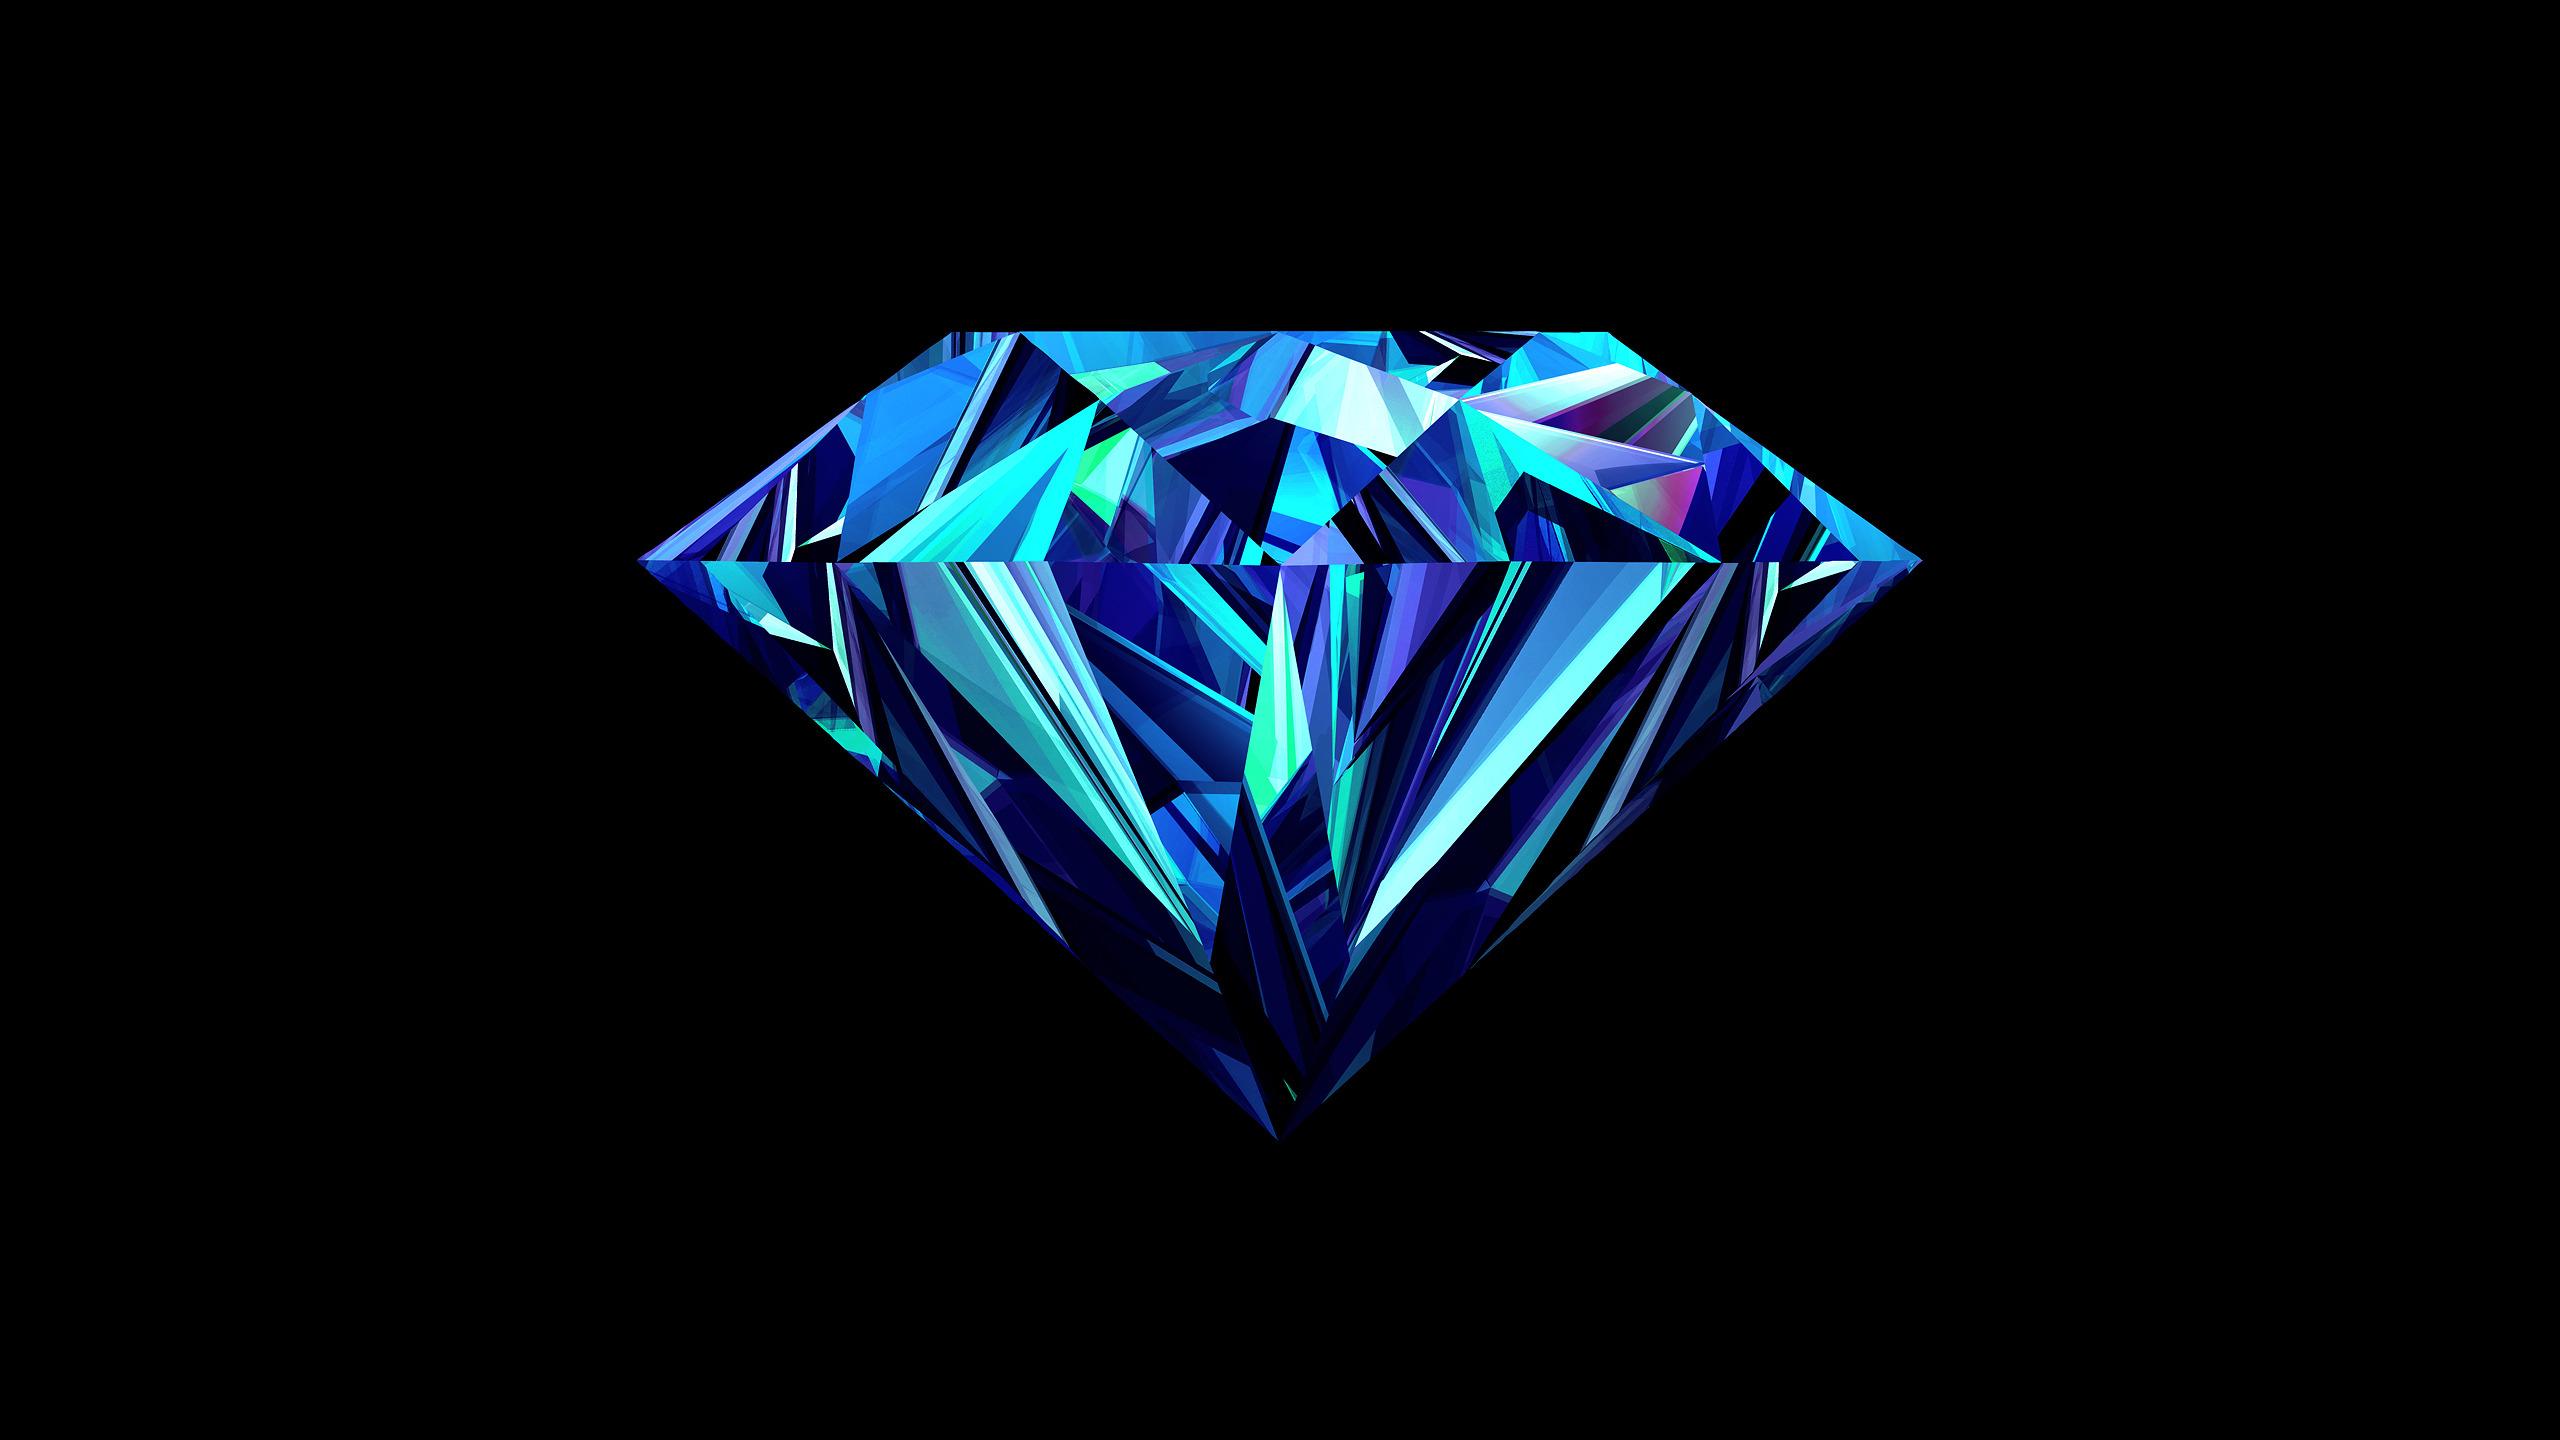 15 Outstanding HD Diamond Wallpapers